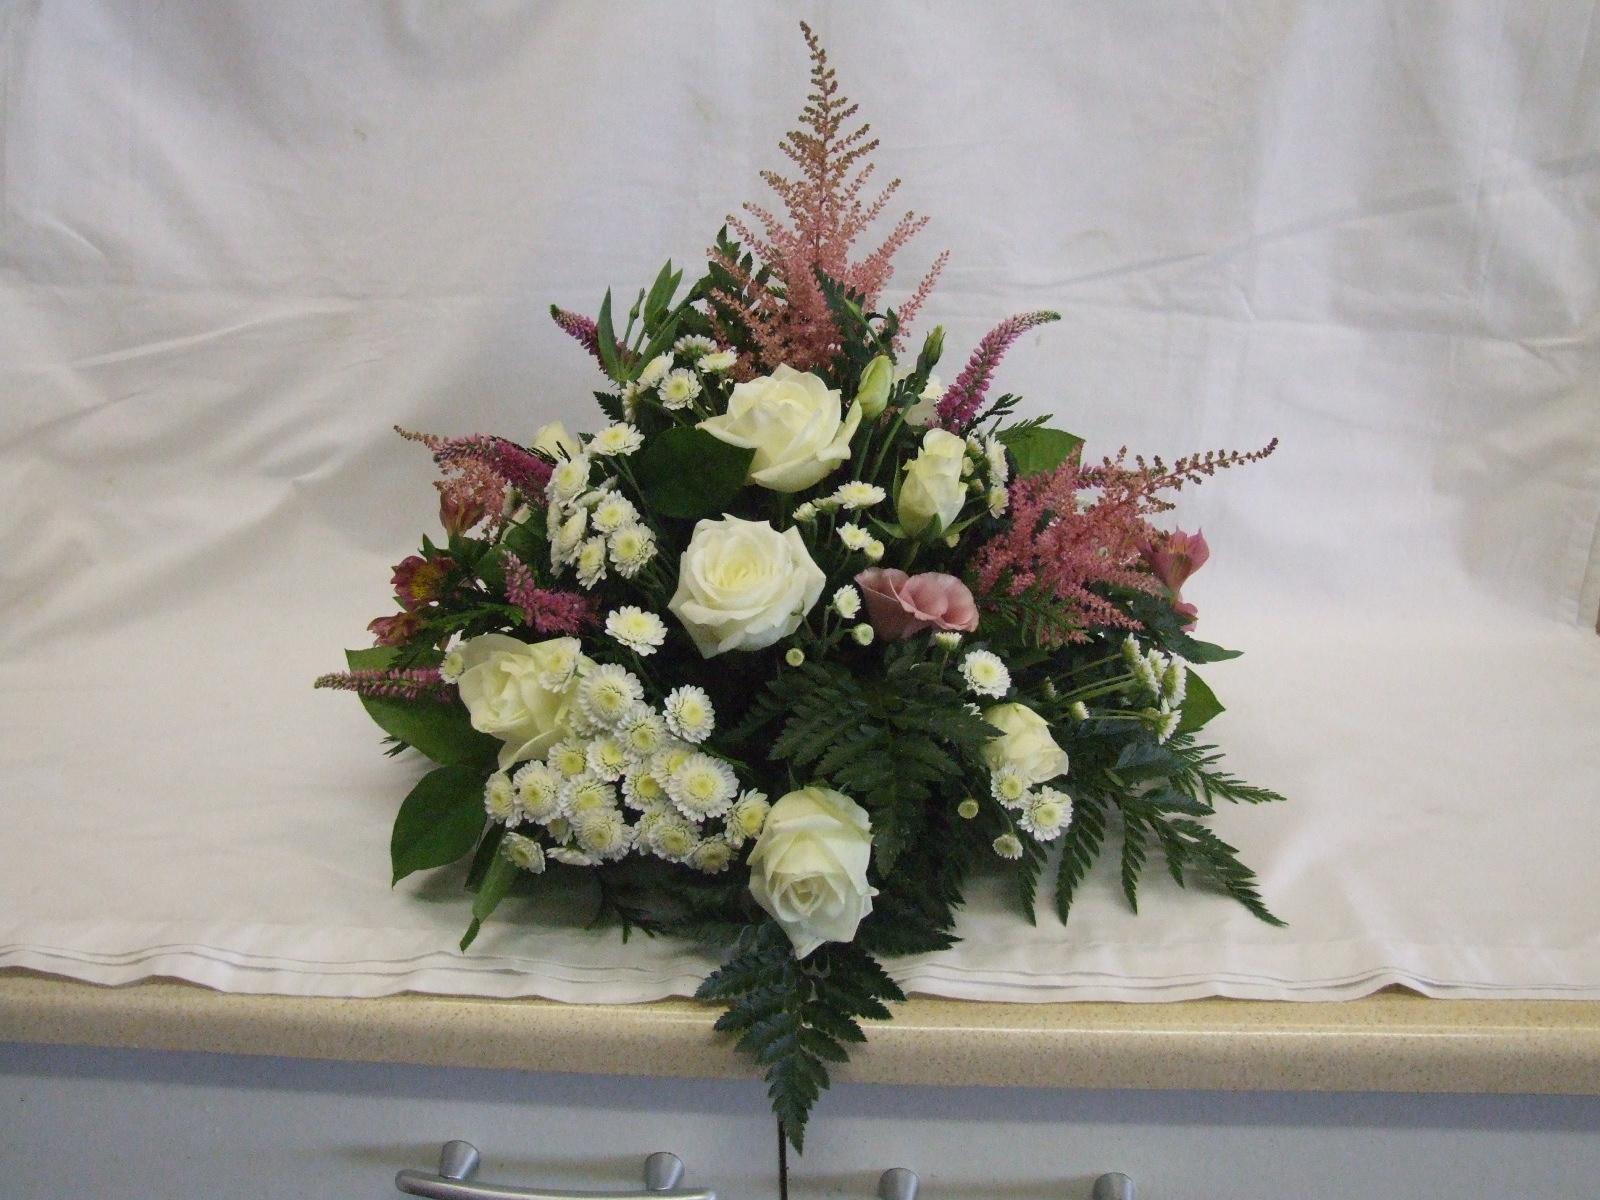 RJ's Florist: 11/10